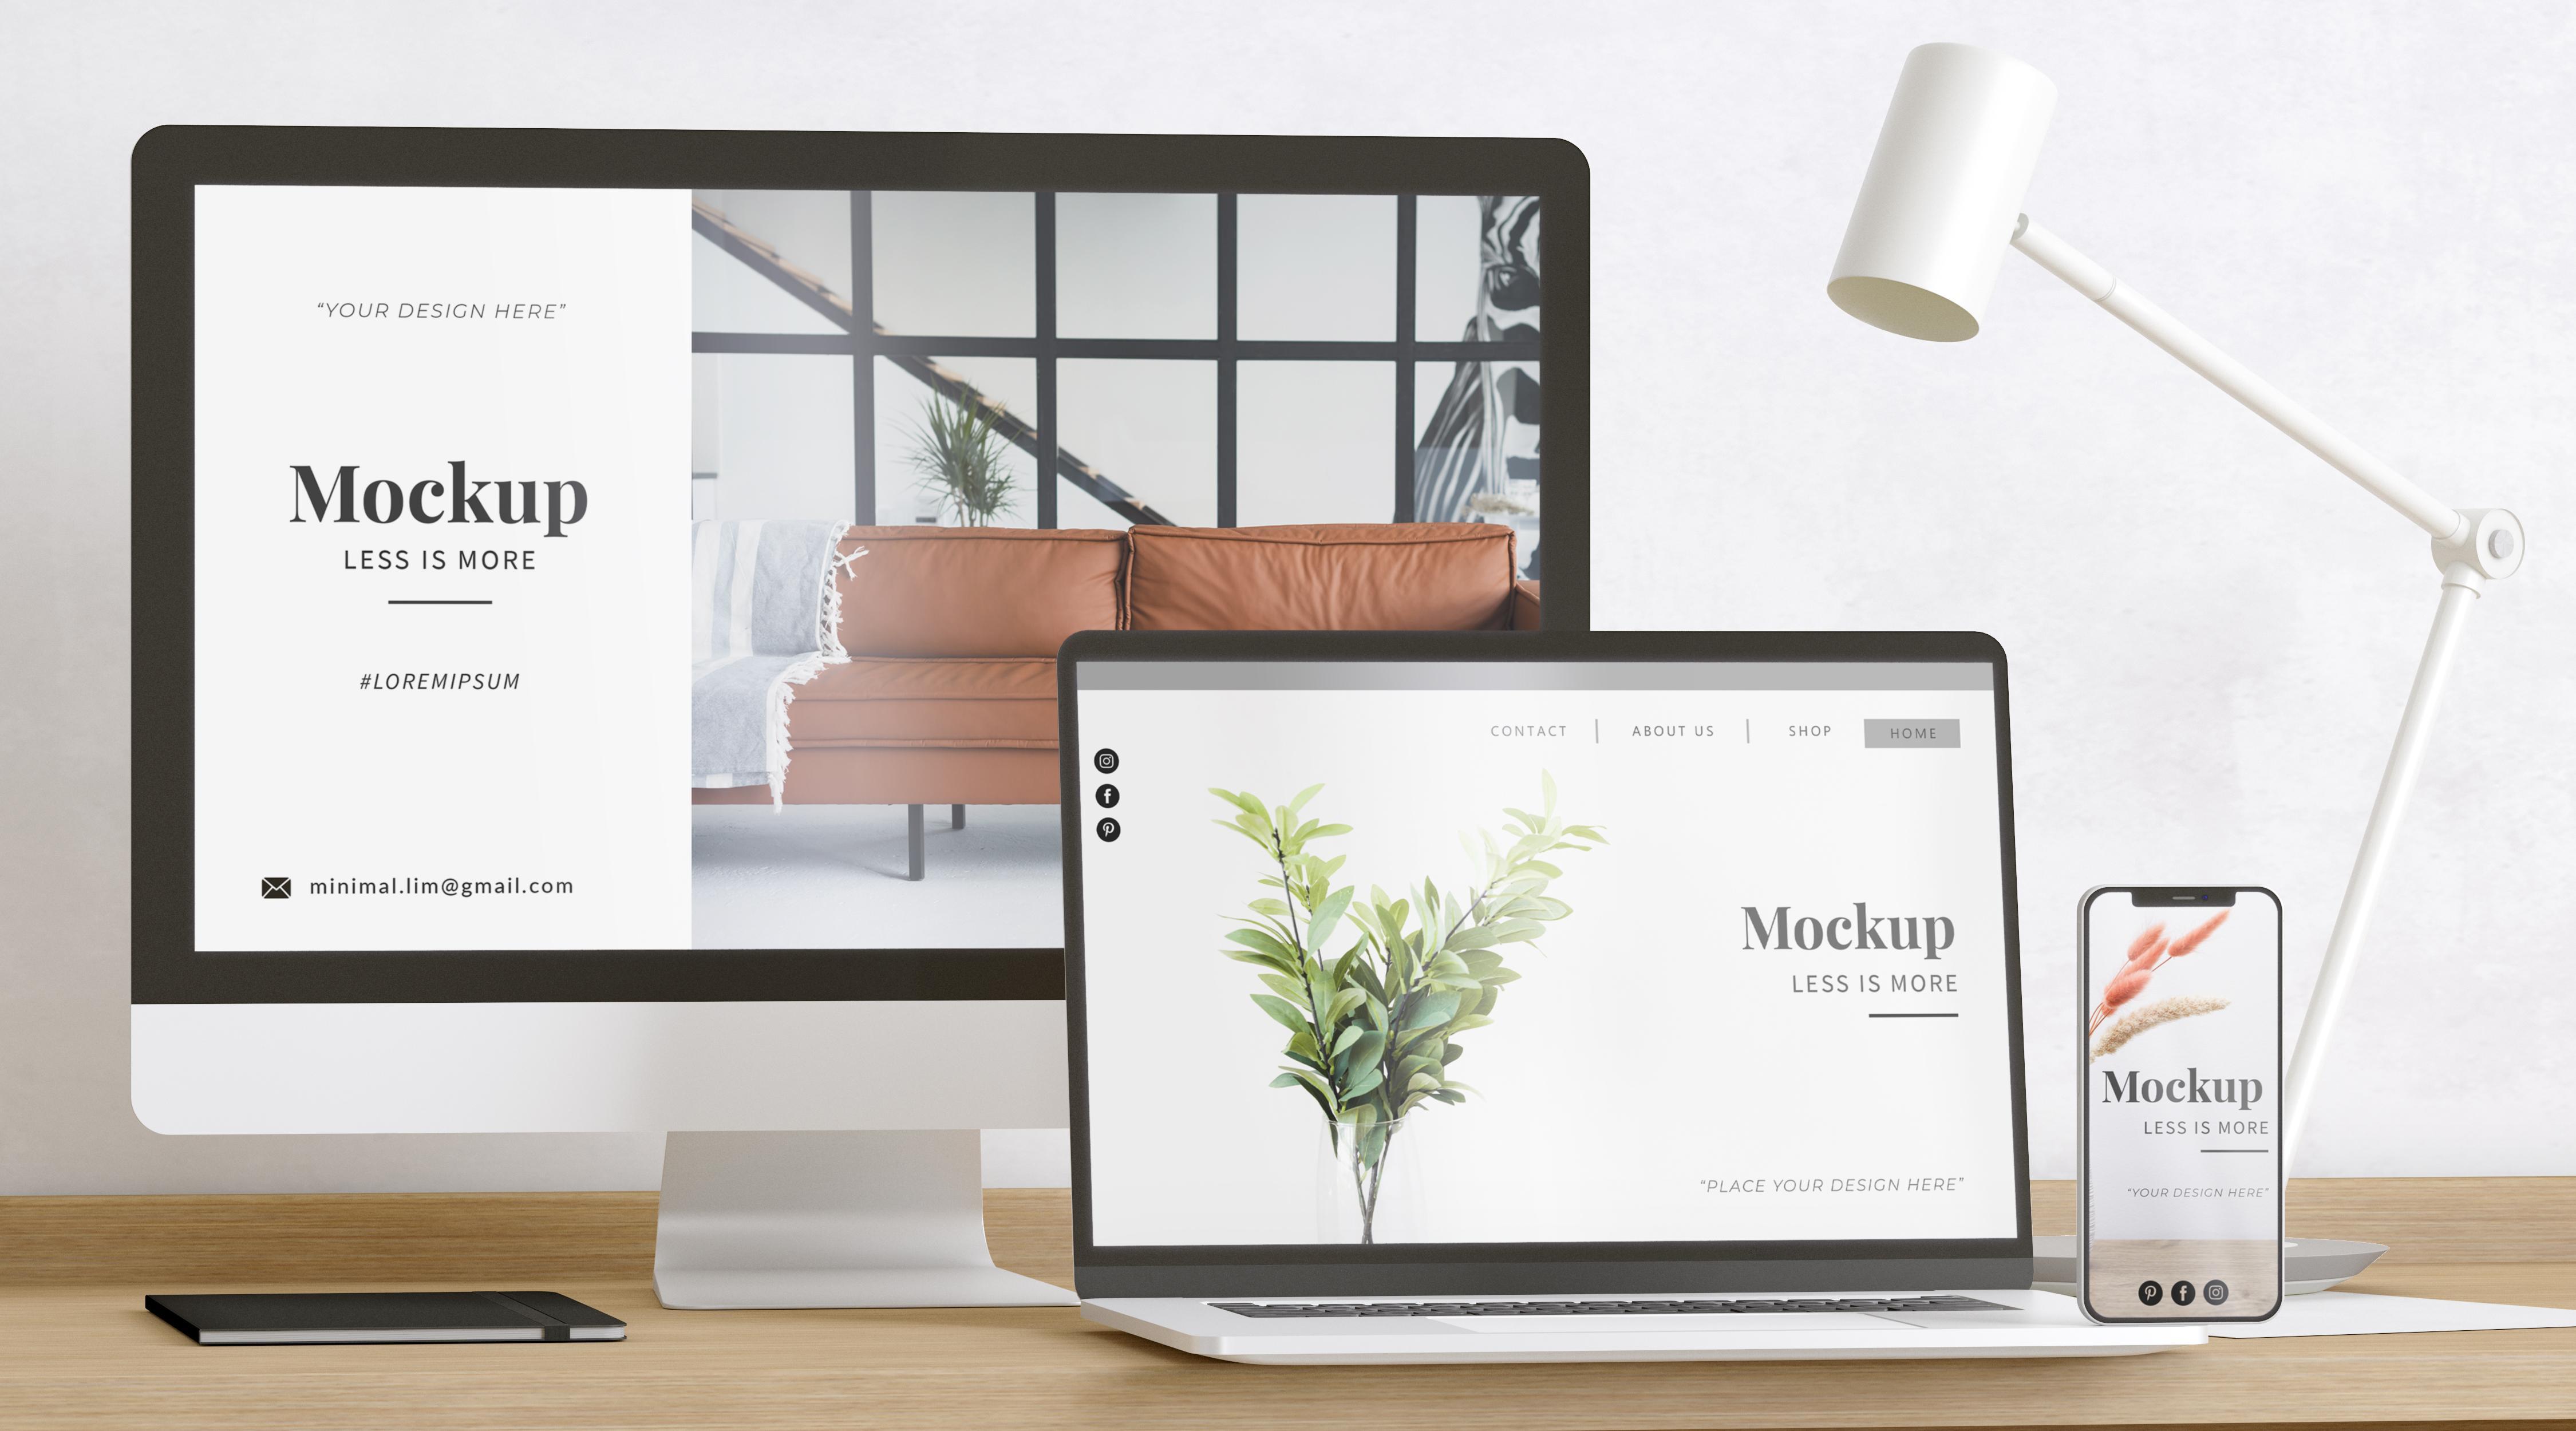 eCom UX Features - Responsive Design